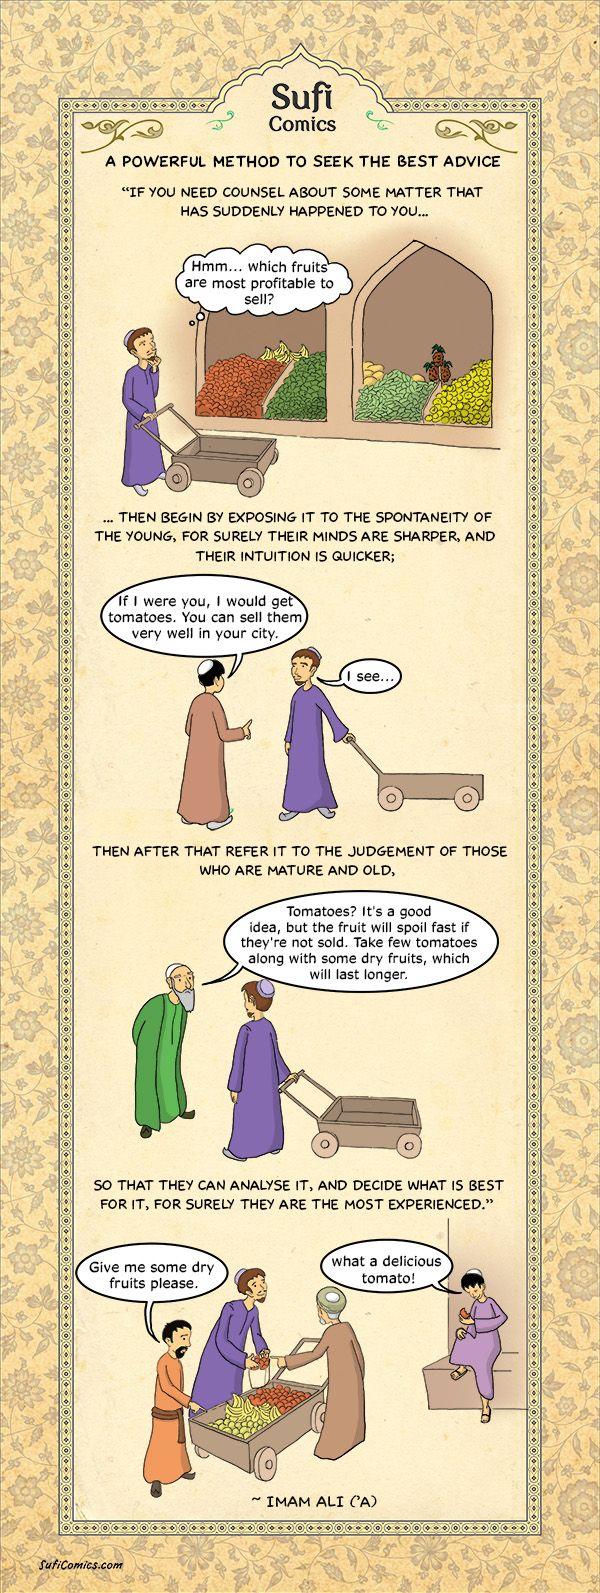 Sufi Comics: A Powerful Method to seek the Best Advice